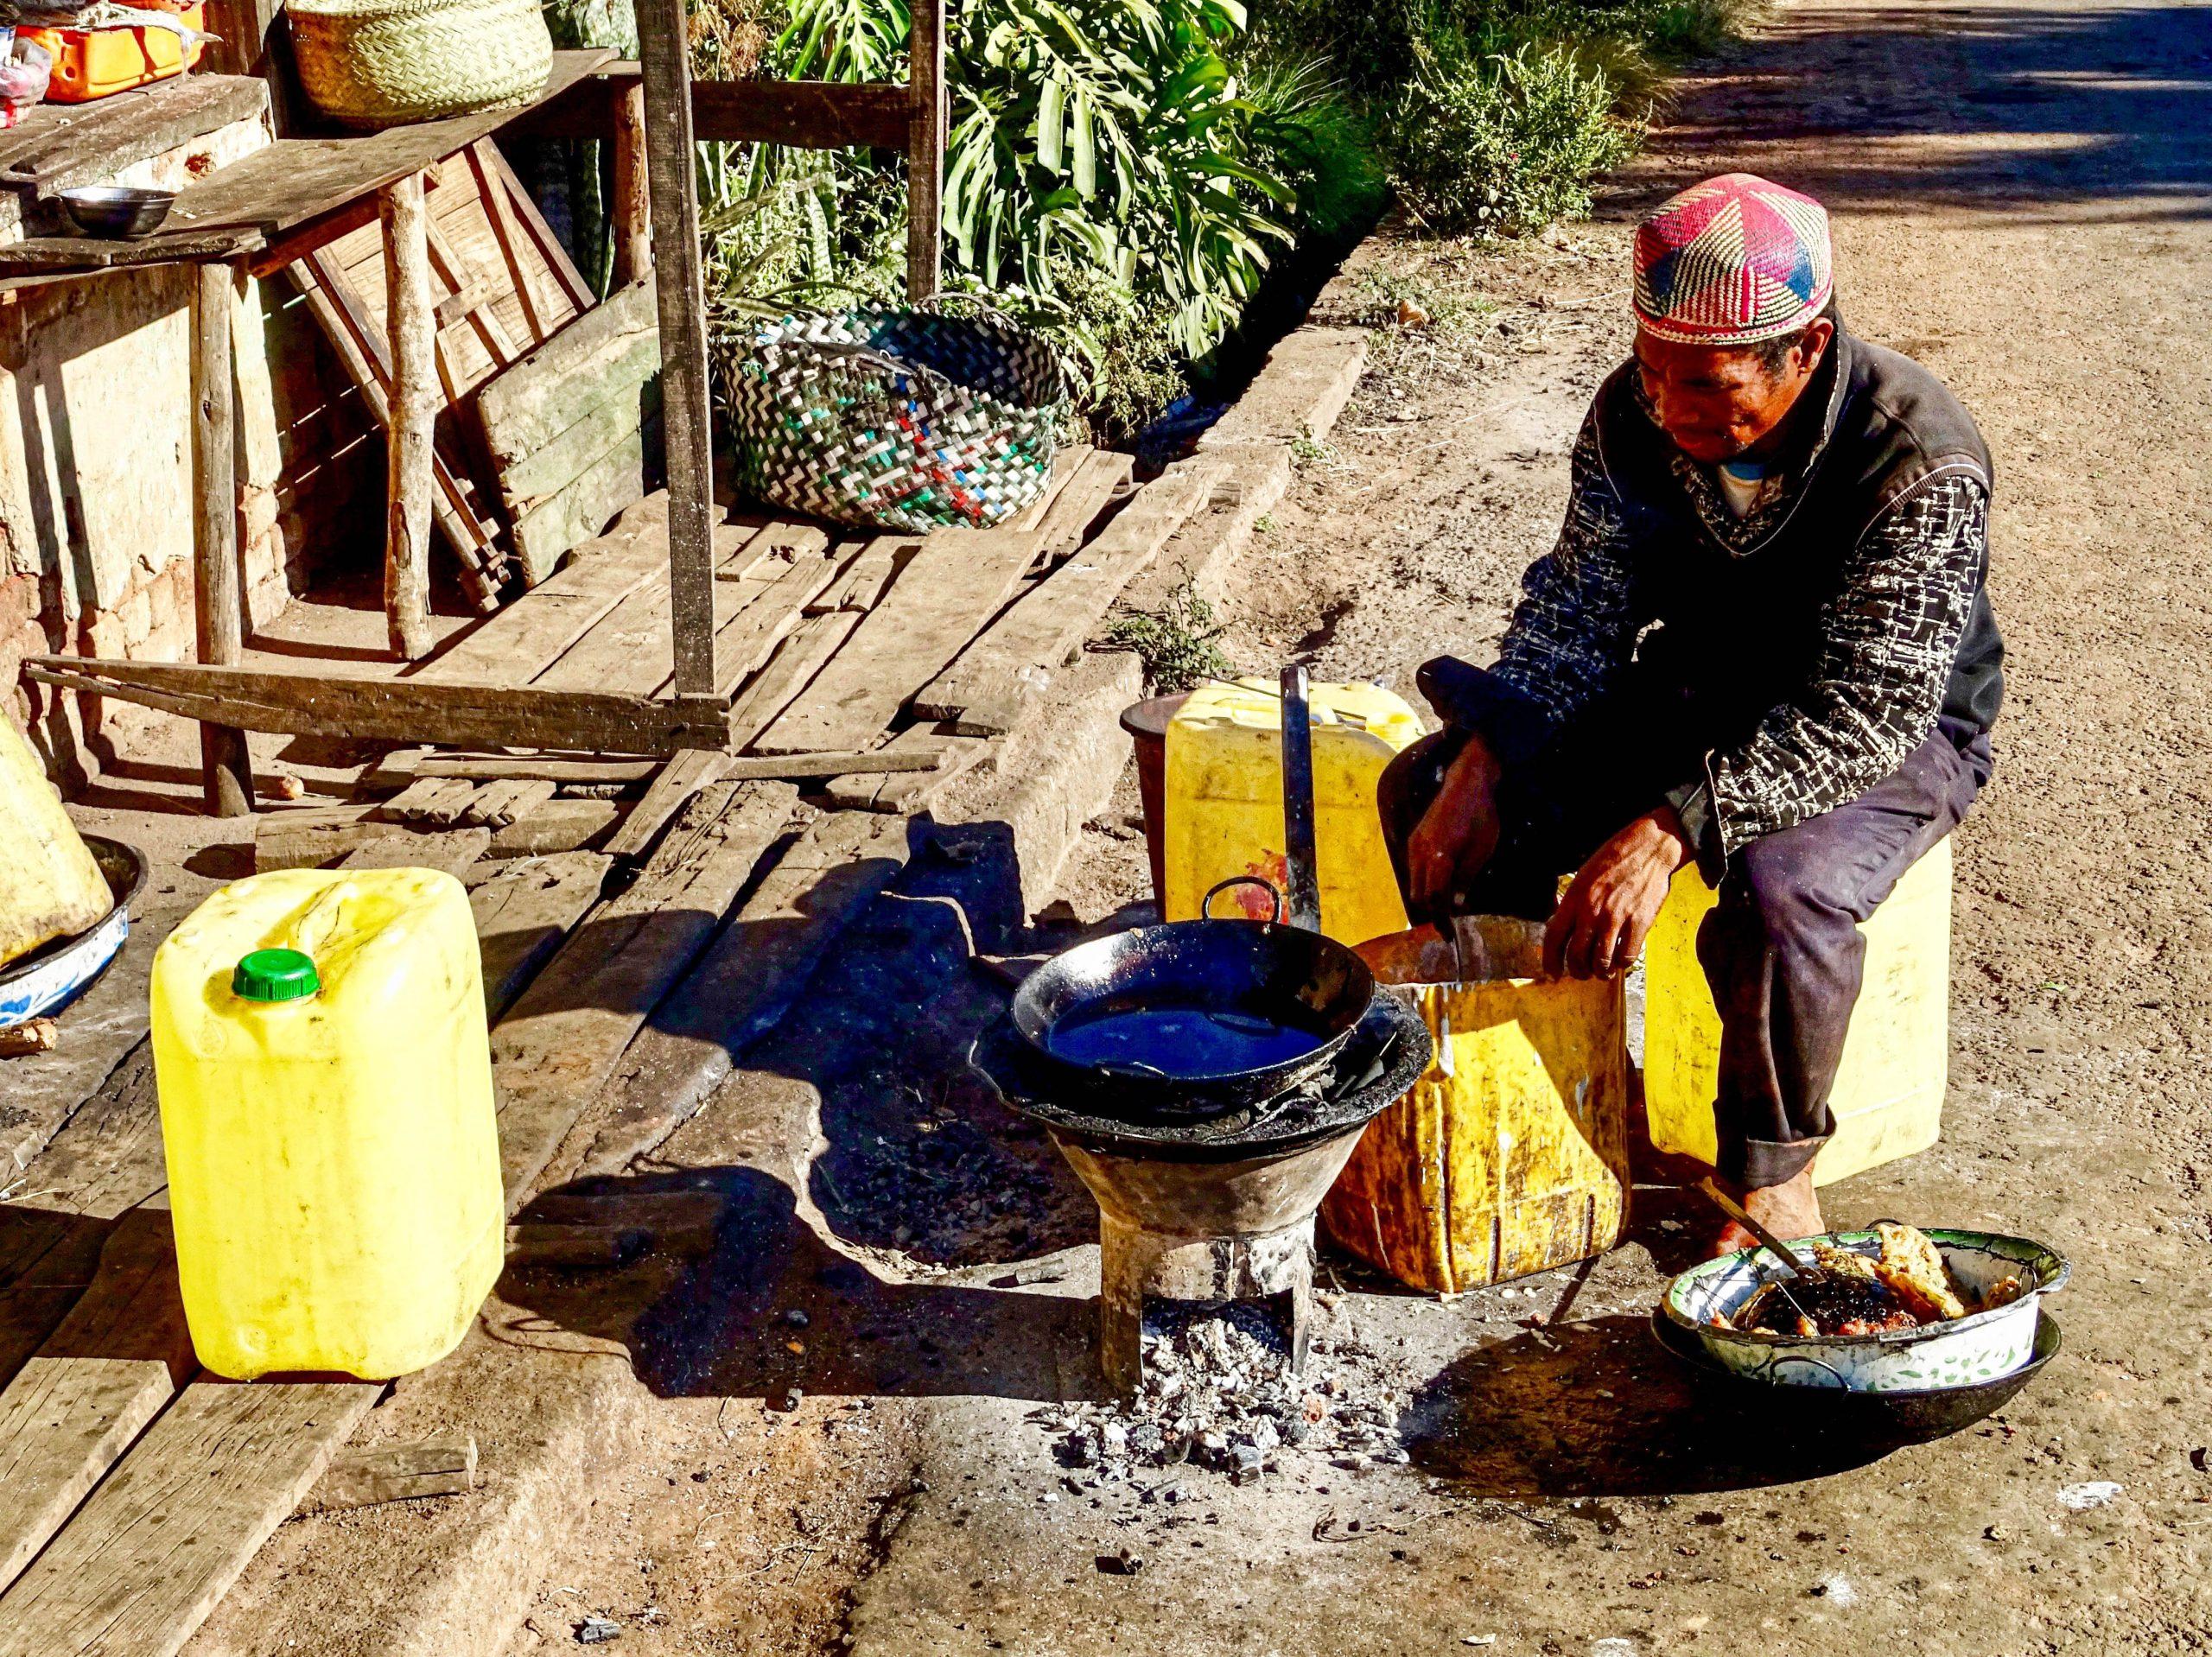 De oliebollenman in Betafo